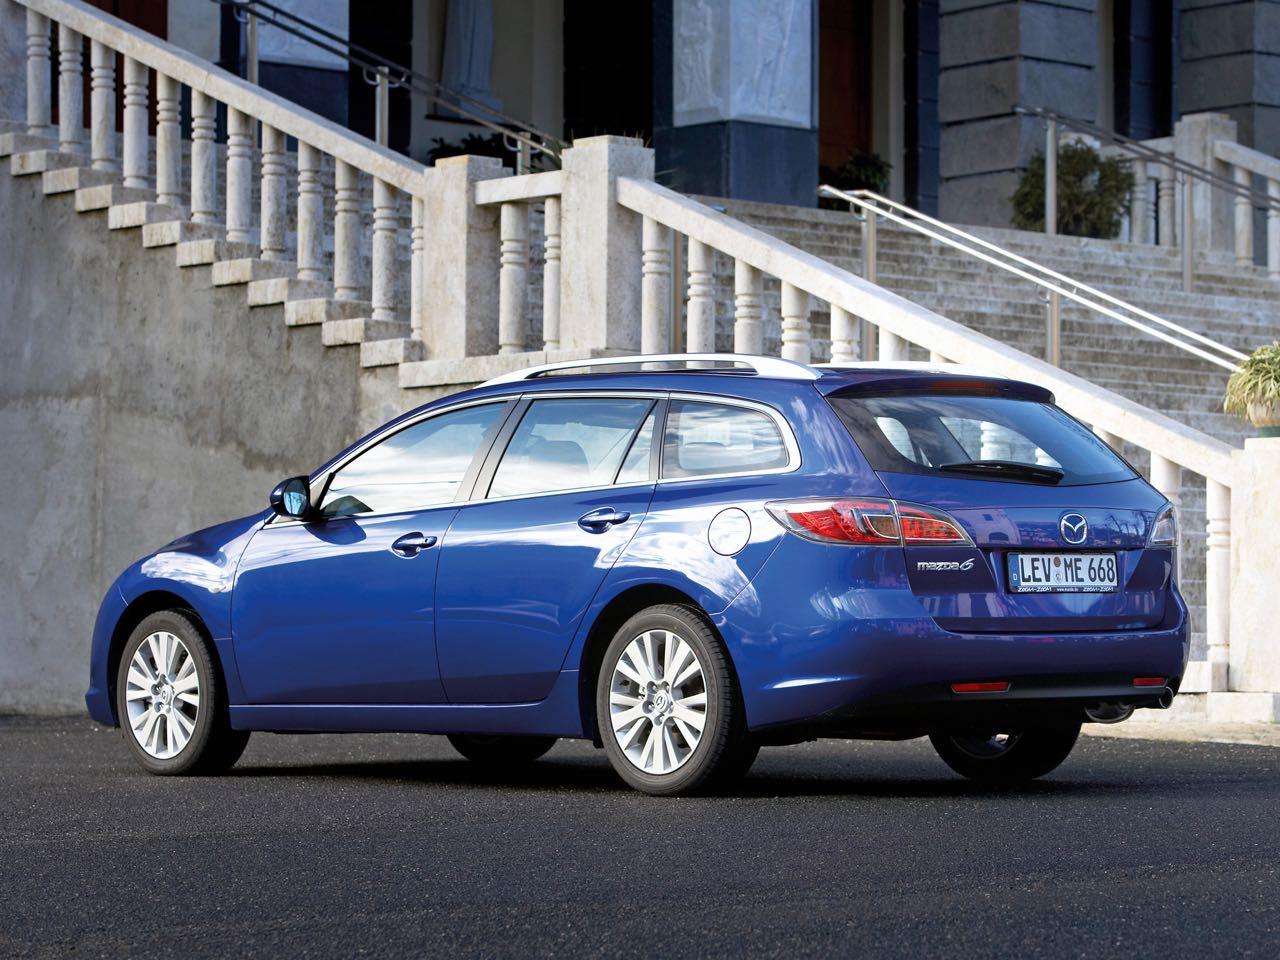 https://noticias.coches.com/wp-content/uploads/2010/01/Mazda-6-Wagon-2007-6.jpg